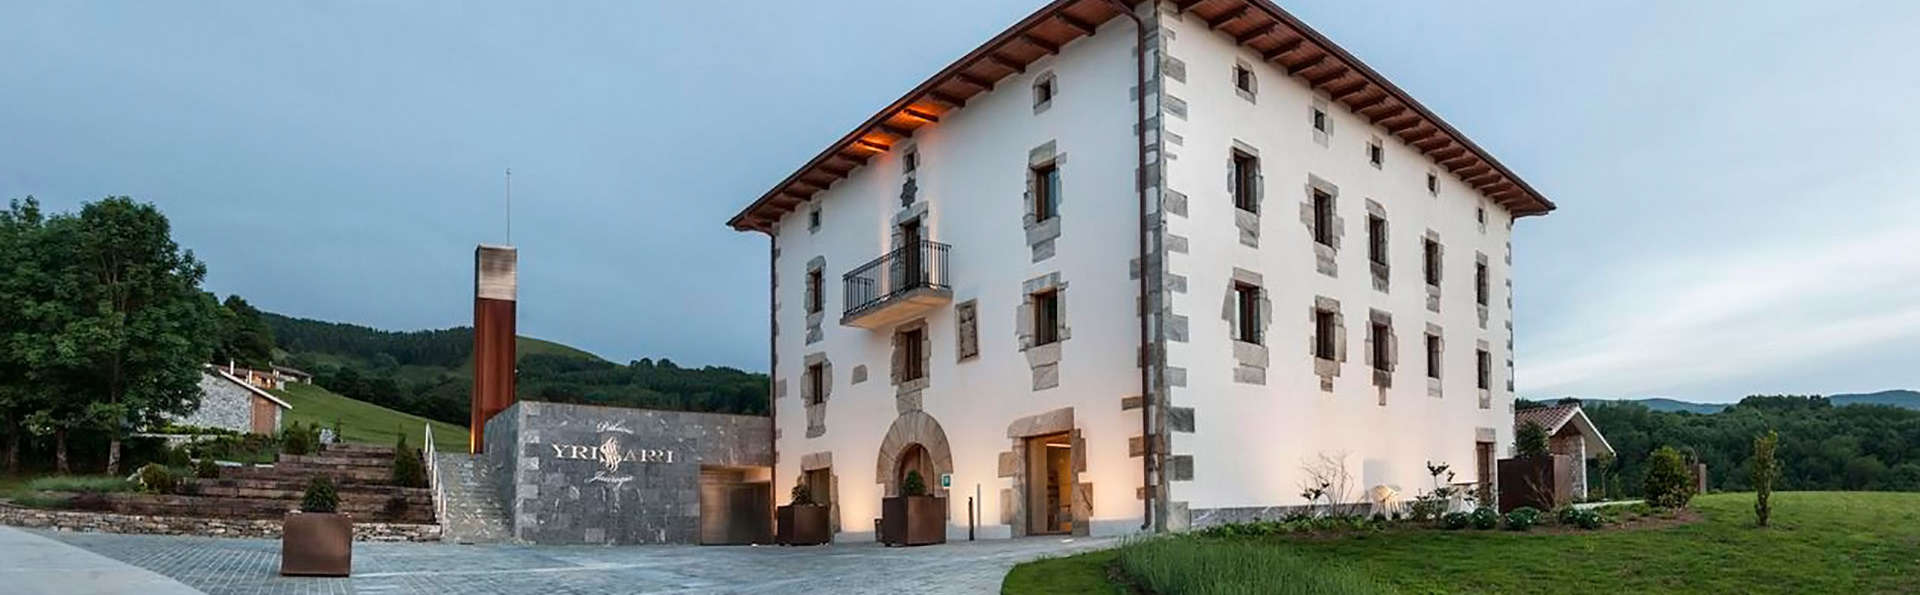 Palacio de Yrisarri by IrriSarri Land - EDIT_front211.jpg